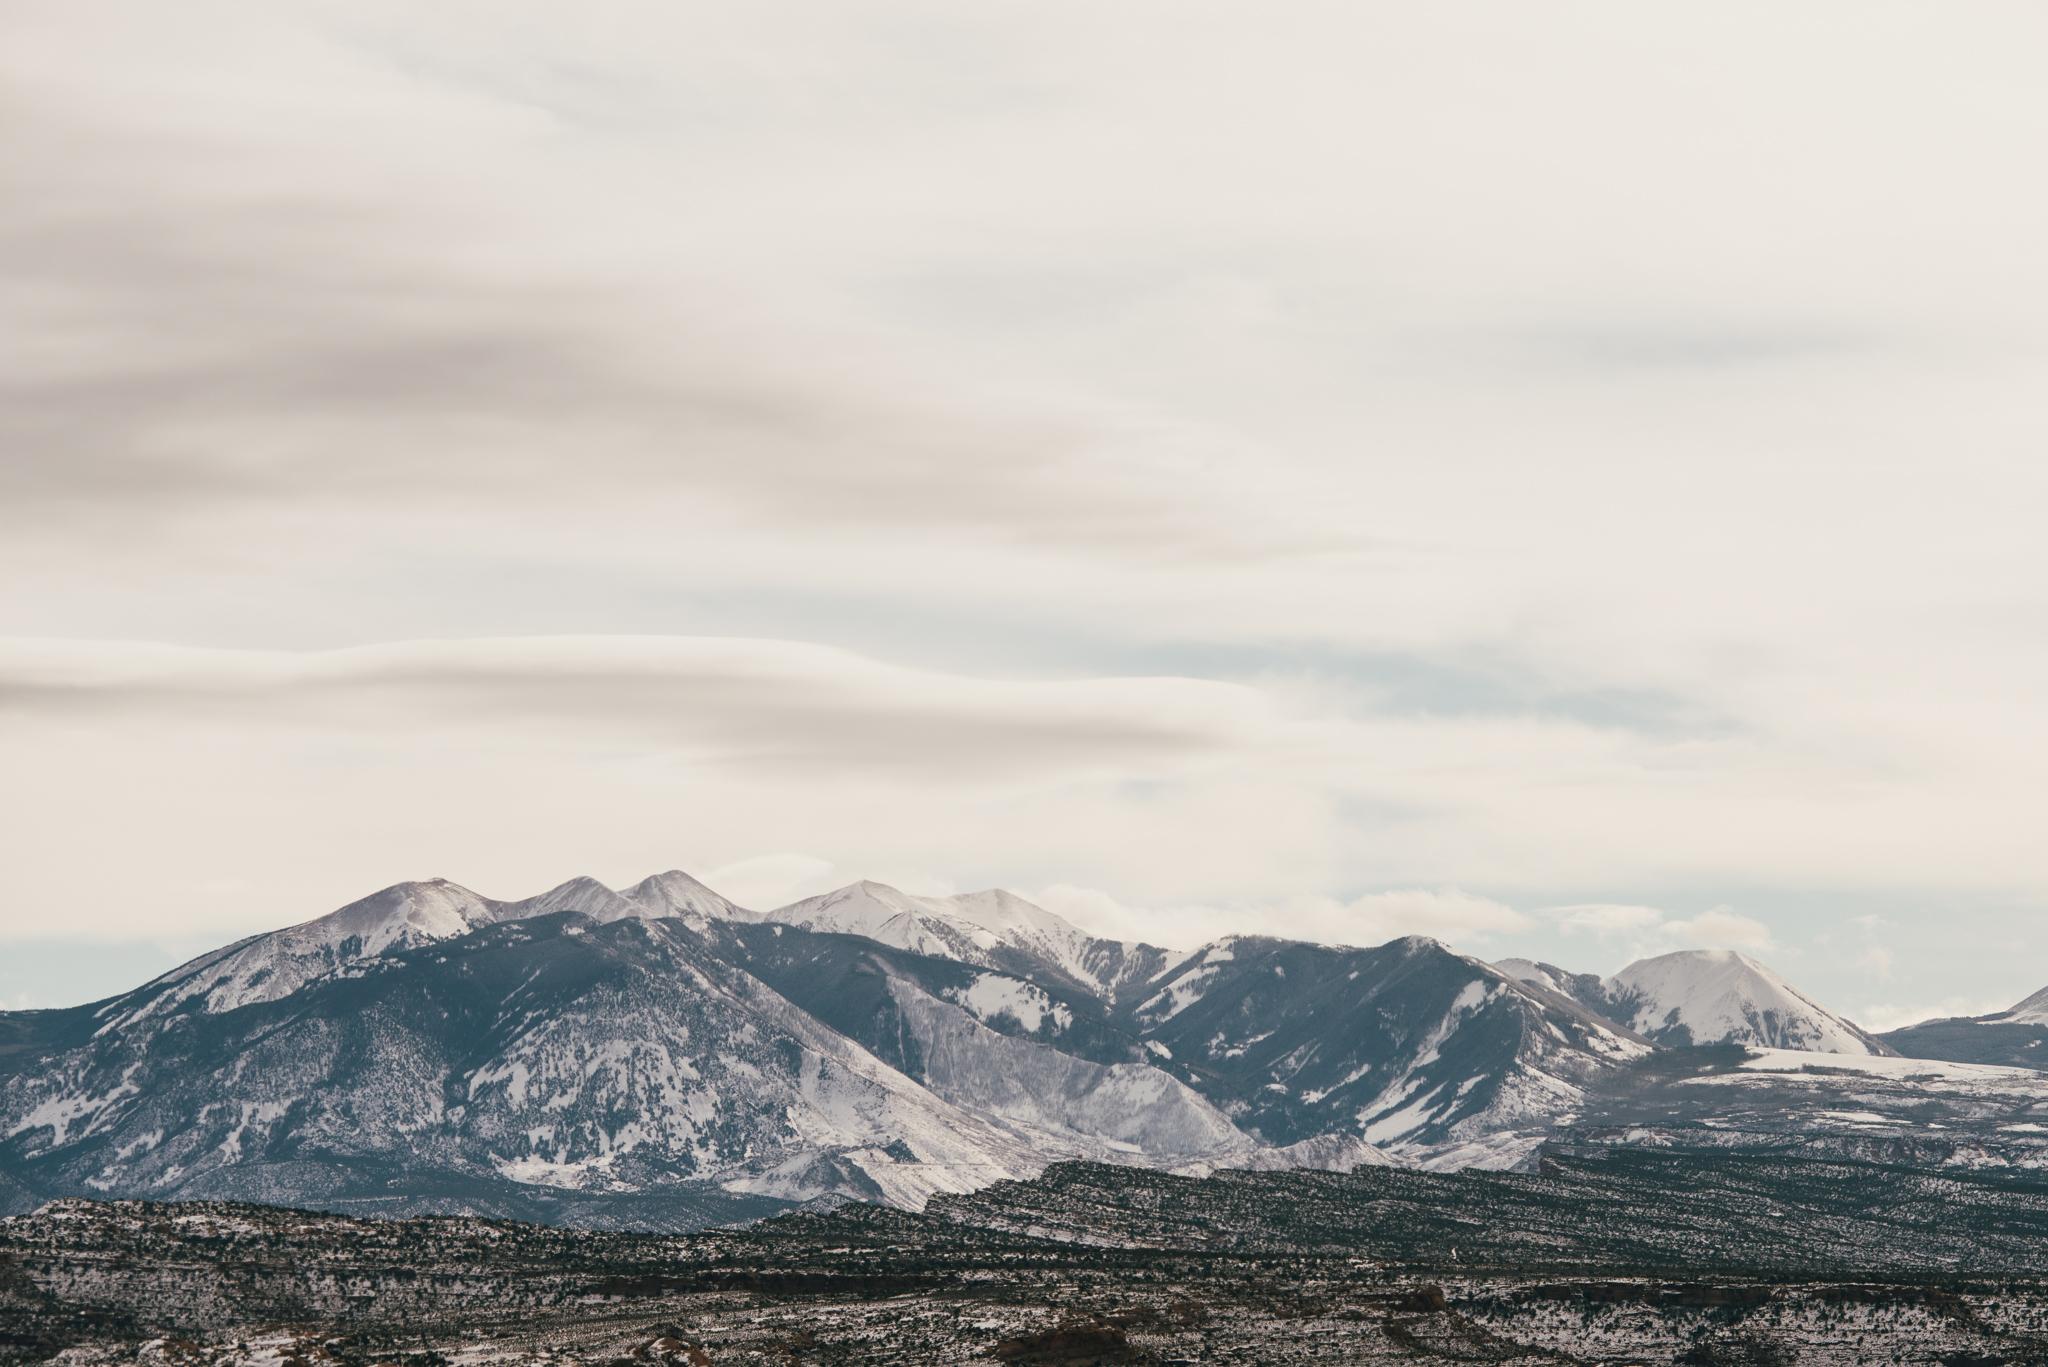 ©The-Ryans-Photography---Arches-National-Park-Moab-Utah-Travel-021.jpg